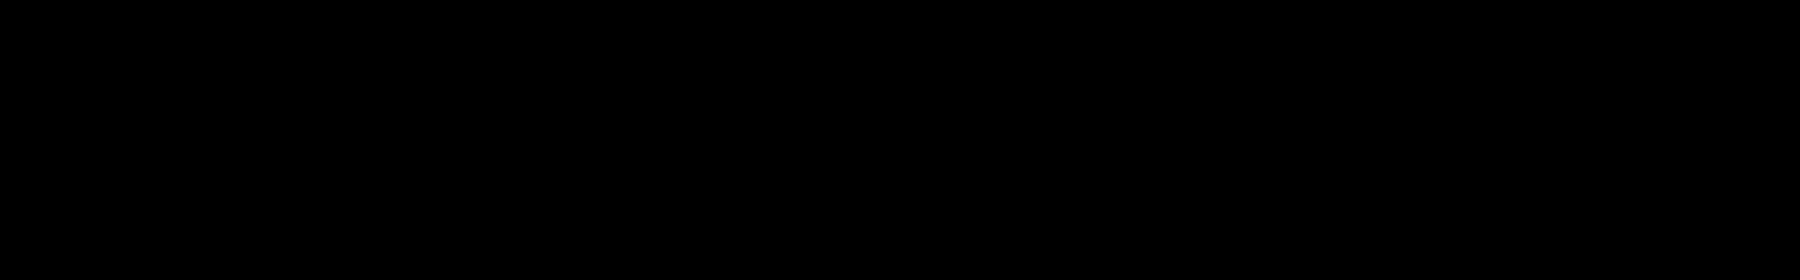 SINEE - ETERNITY audio waveform